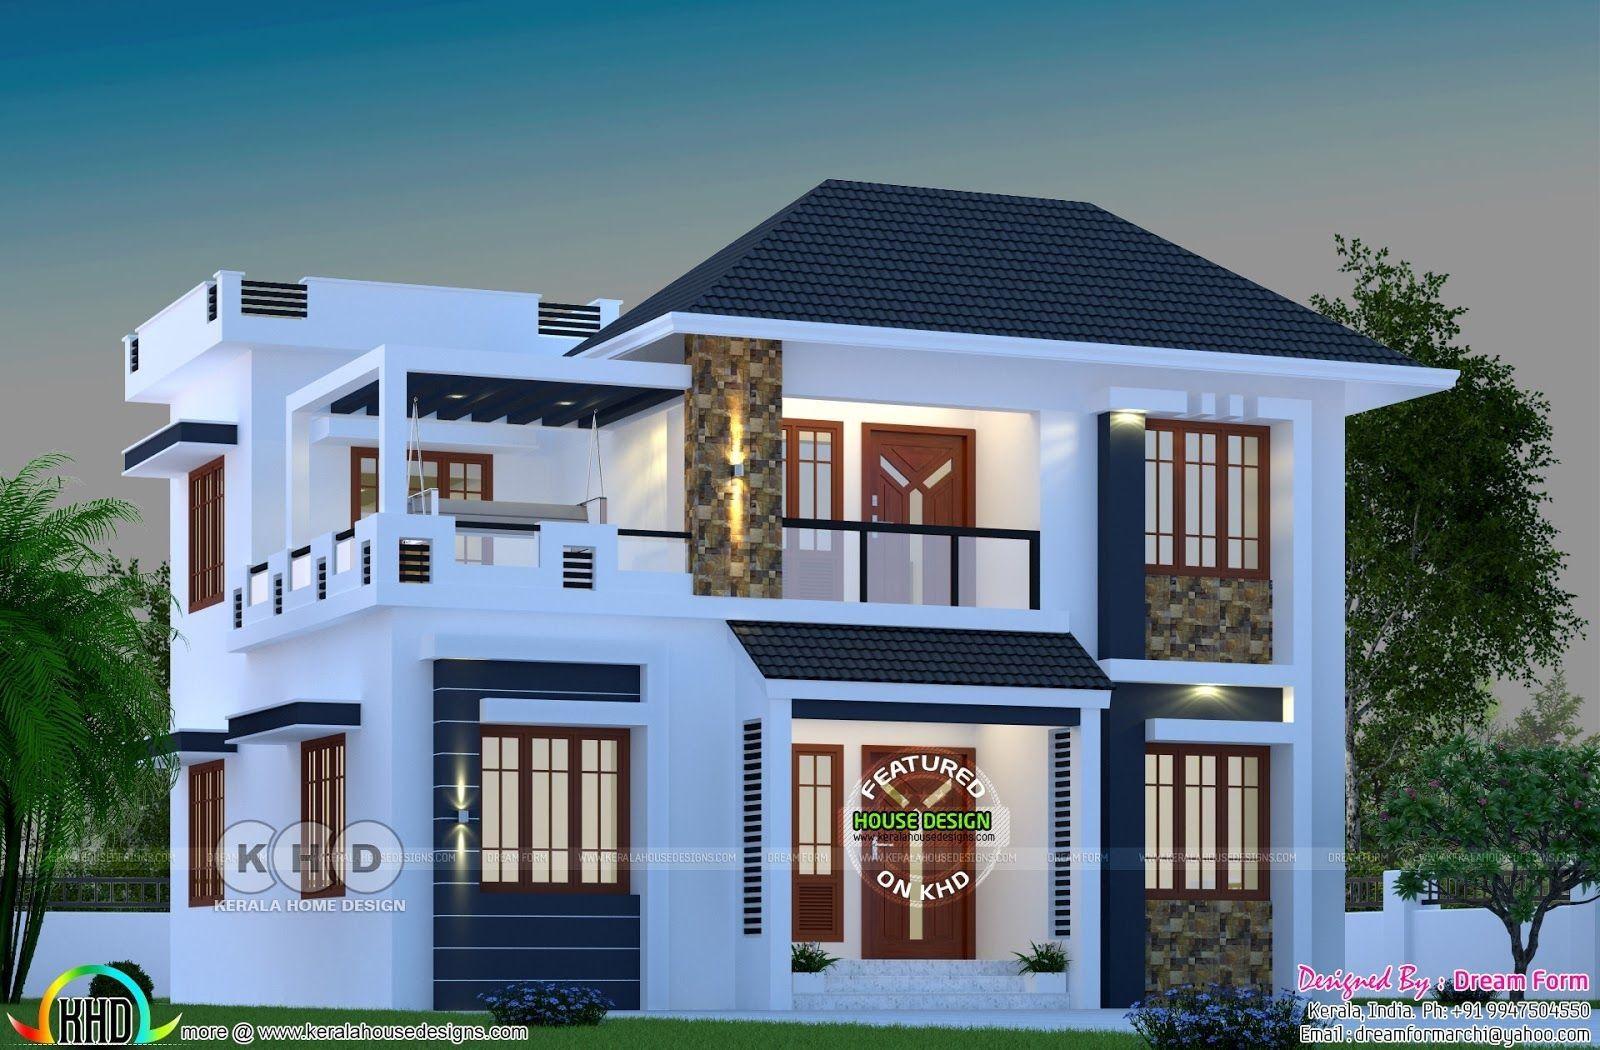 22 Small Mediterranean House Plans In 2020 Kerala House Design